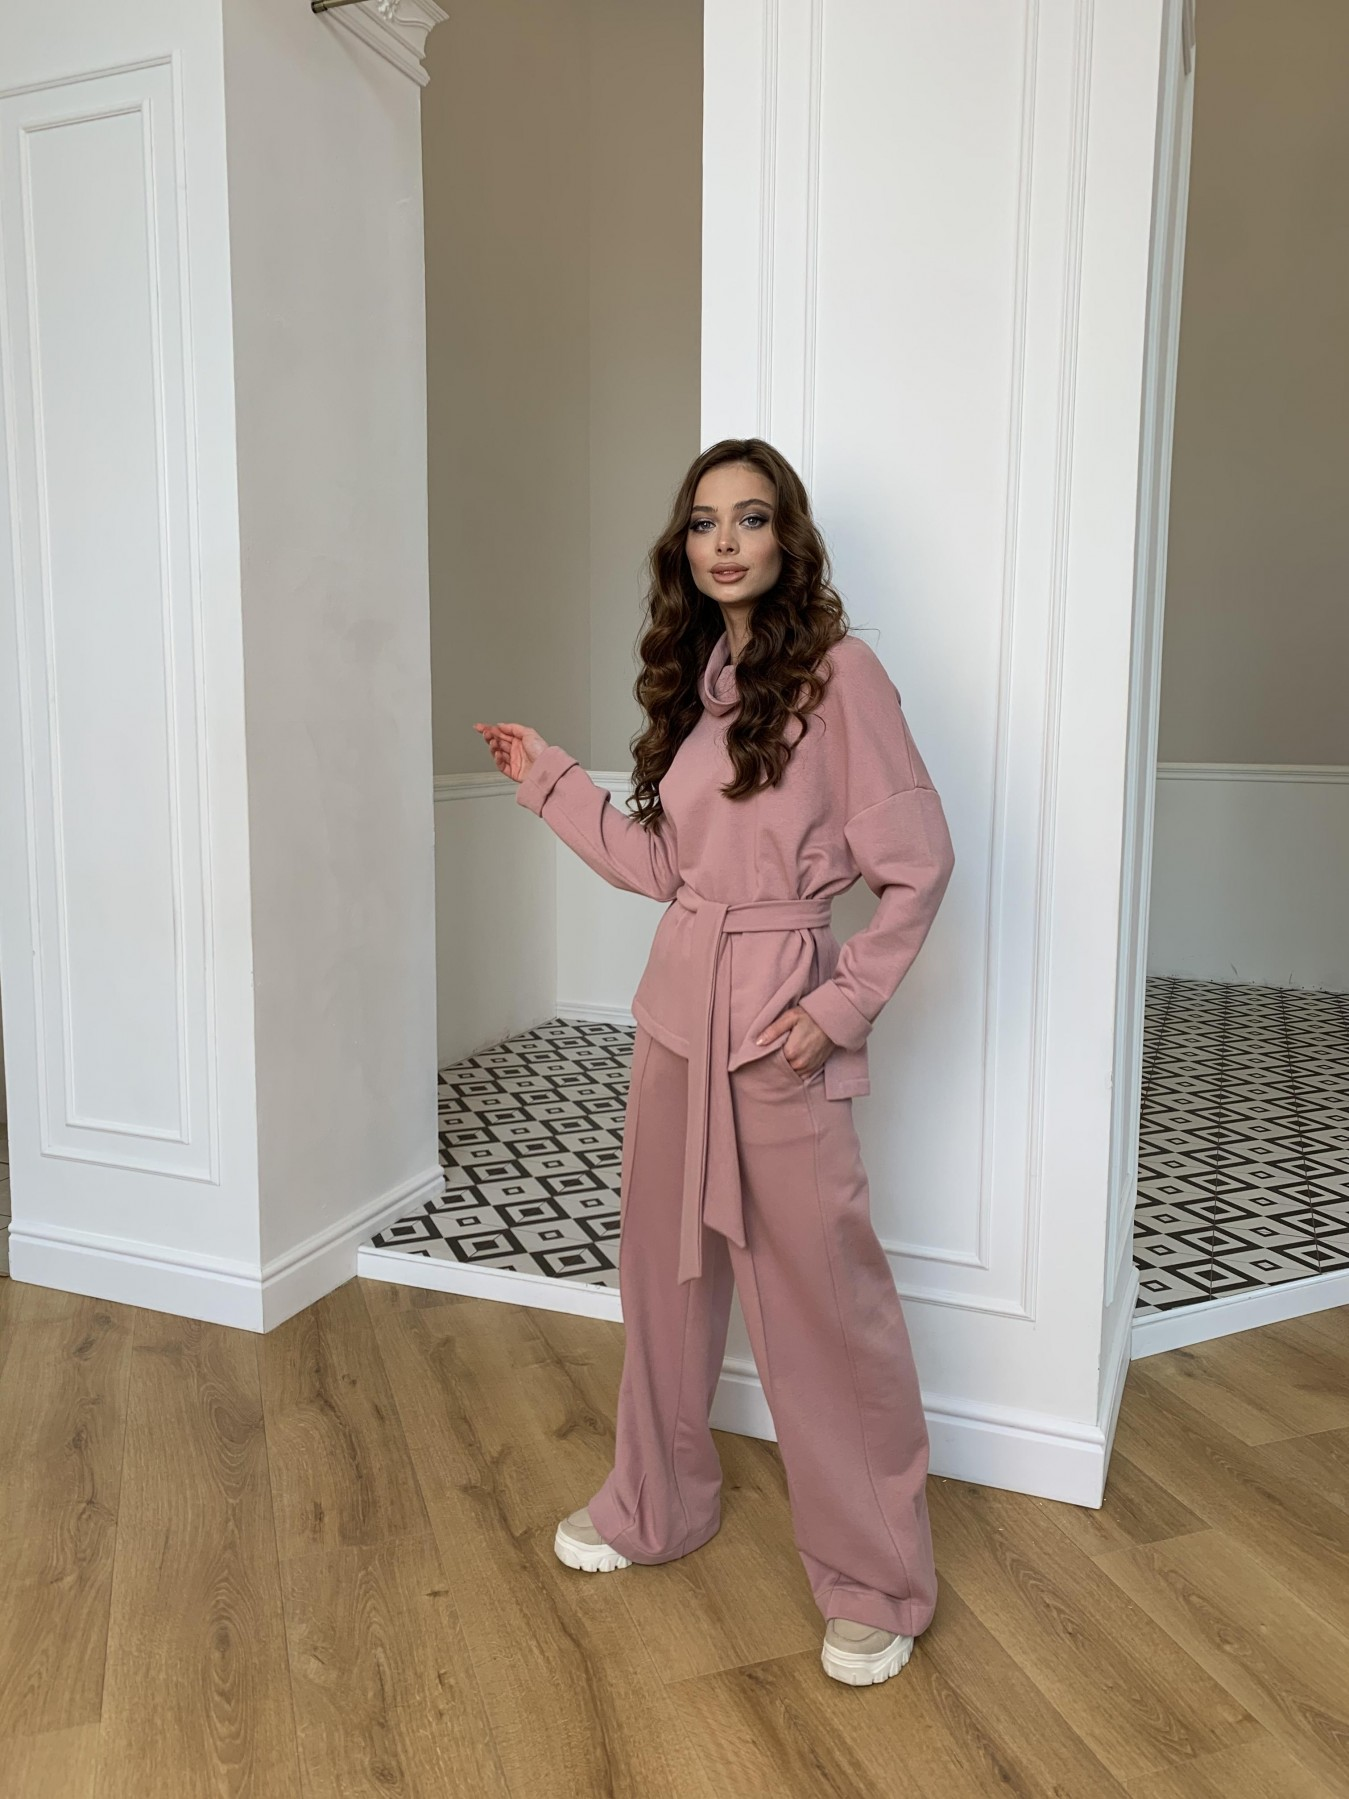 Джаст костюм Oversize  3х нитка 10564 АРТ. 47244 Цвет: Пудра - фото 2, интернет магазин tm-modus.ru